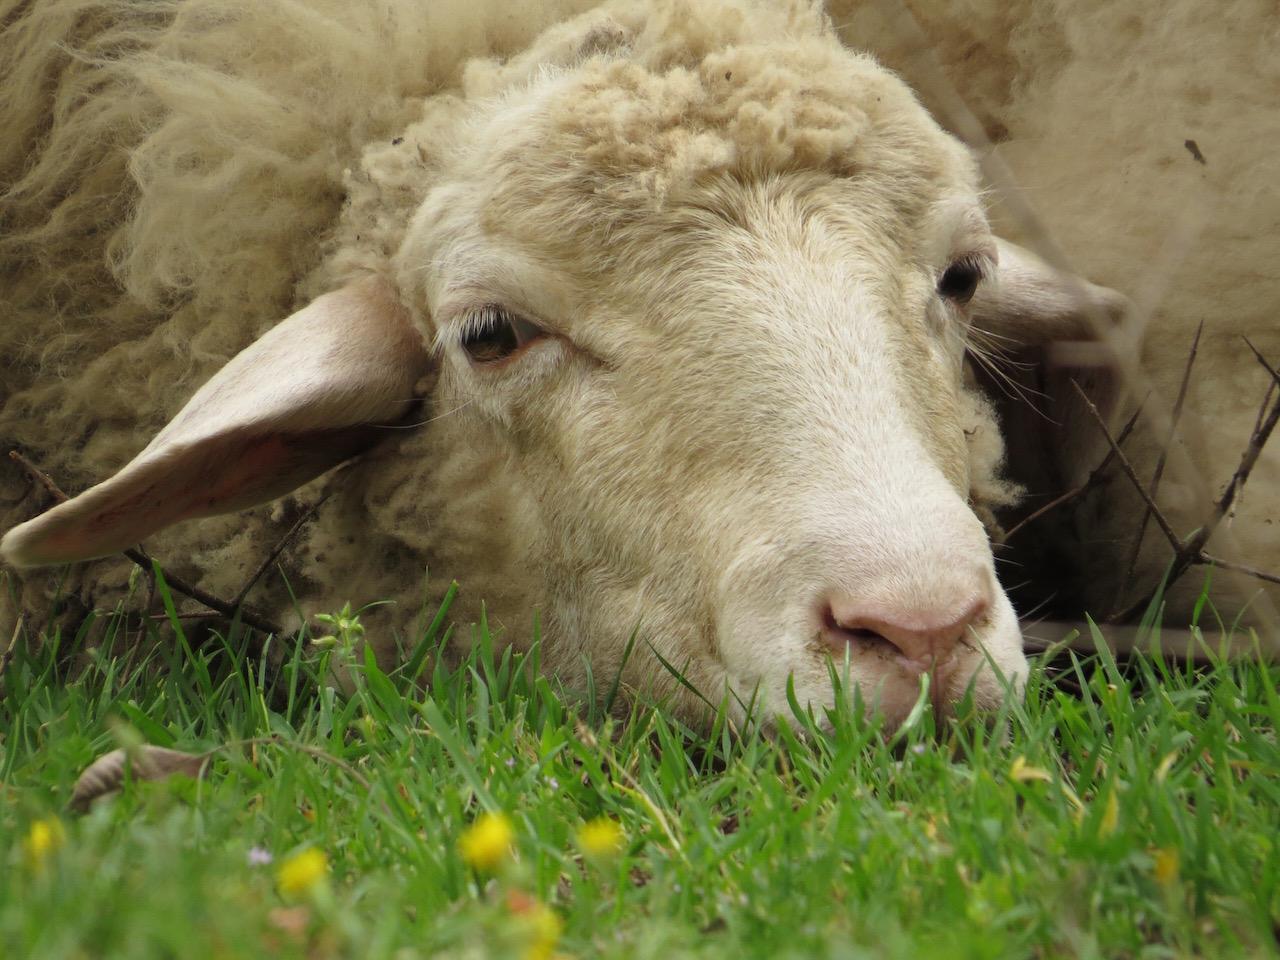 The Interrupting Sheep